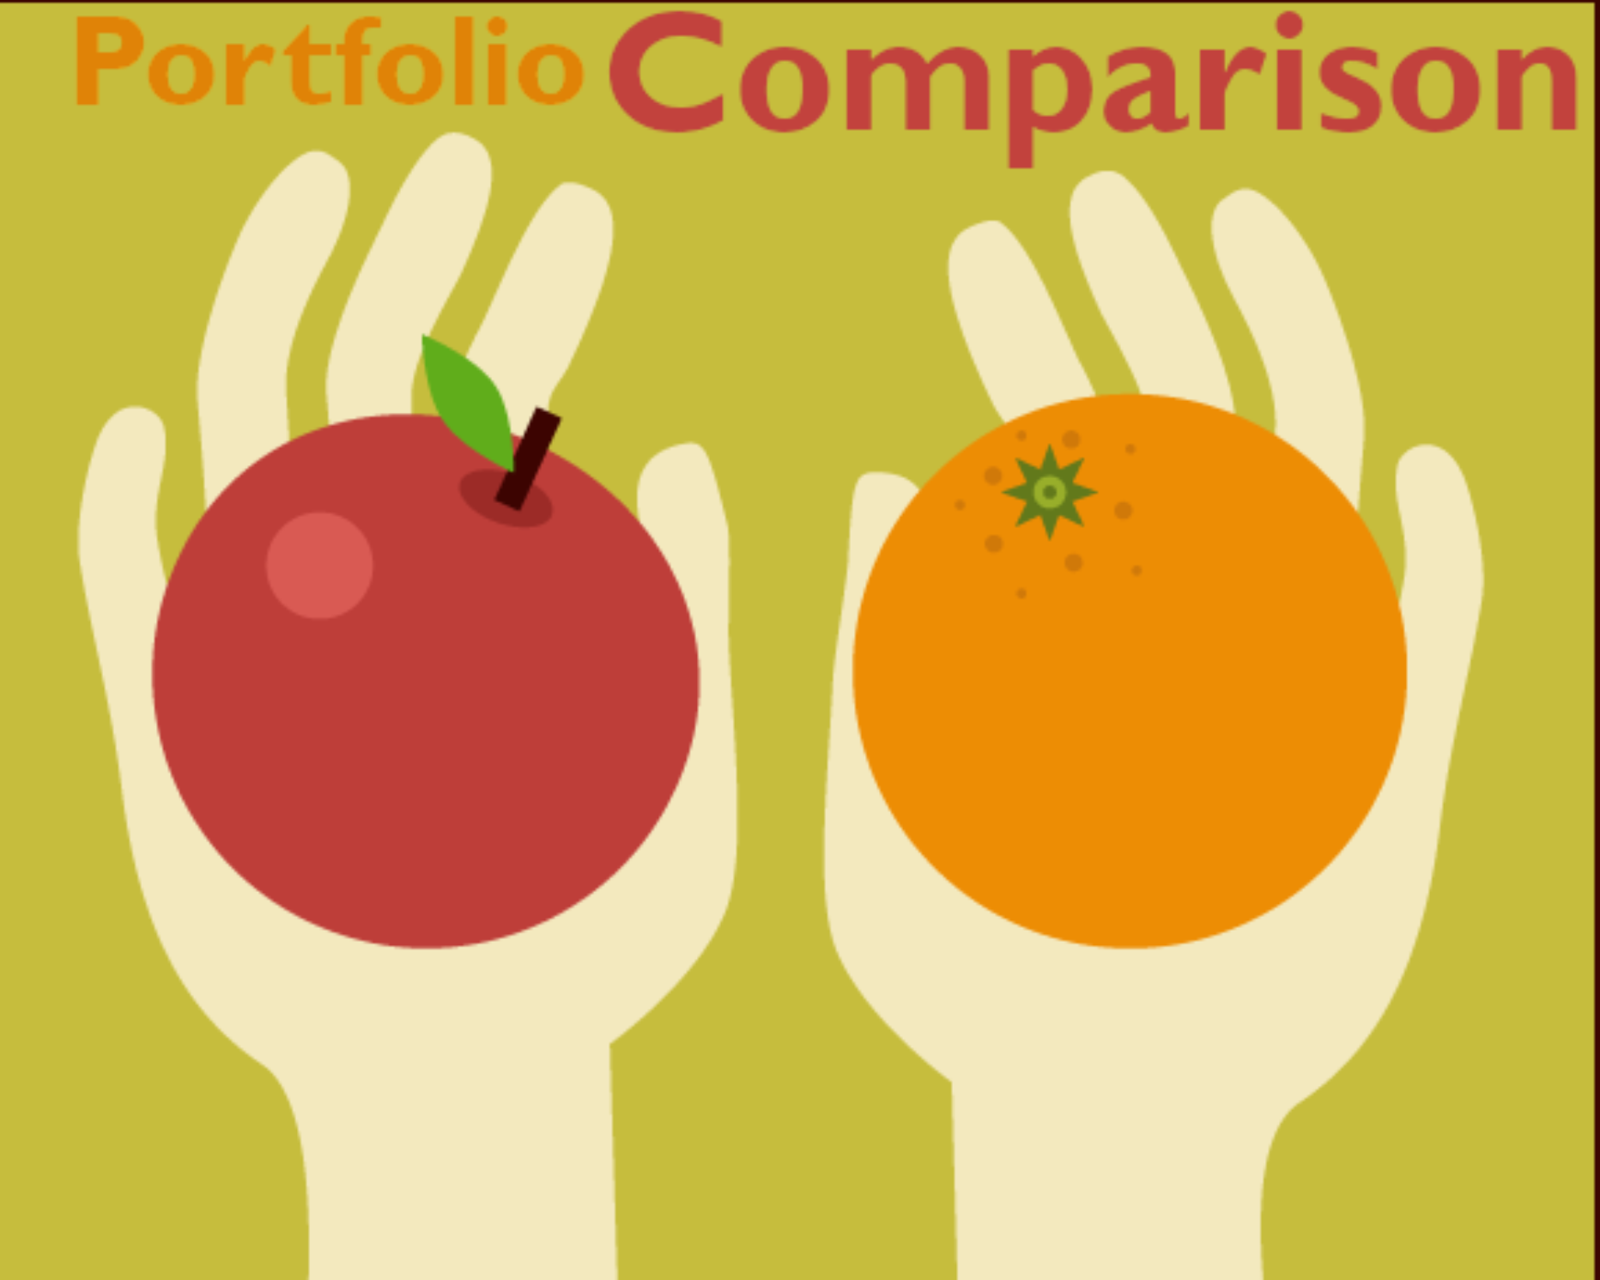 Portfolio Comparison